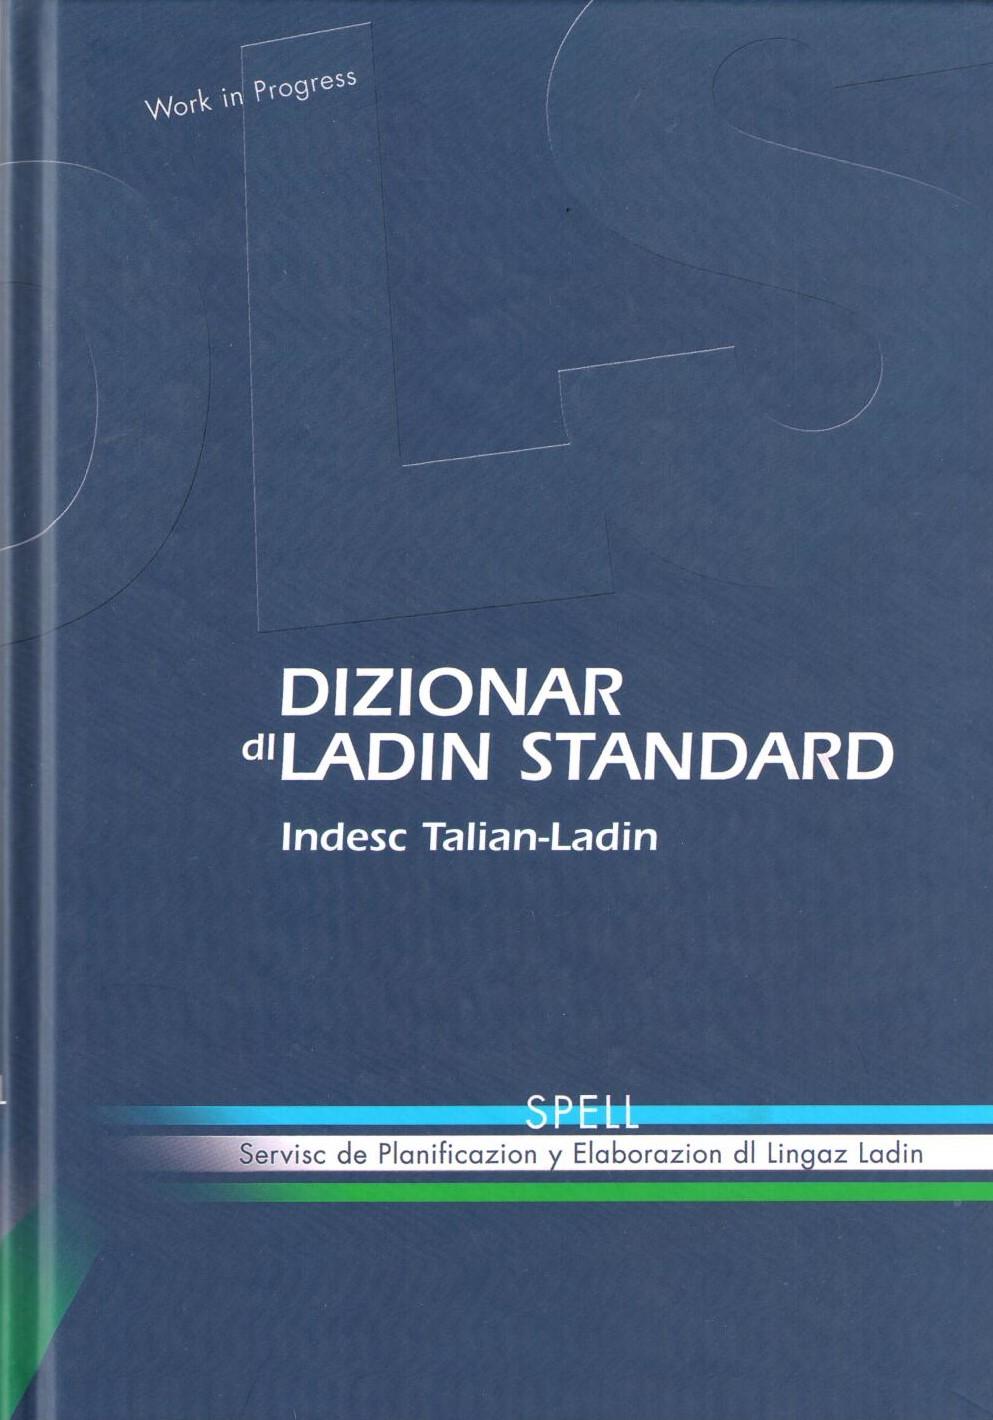 Dizionar dl ladin standard. Indesc Talian-Ladin, SPELL, Servisc de Planificazion y Elaborazion dl Li